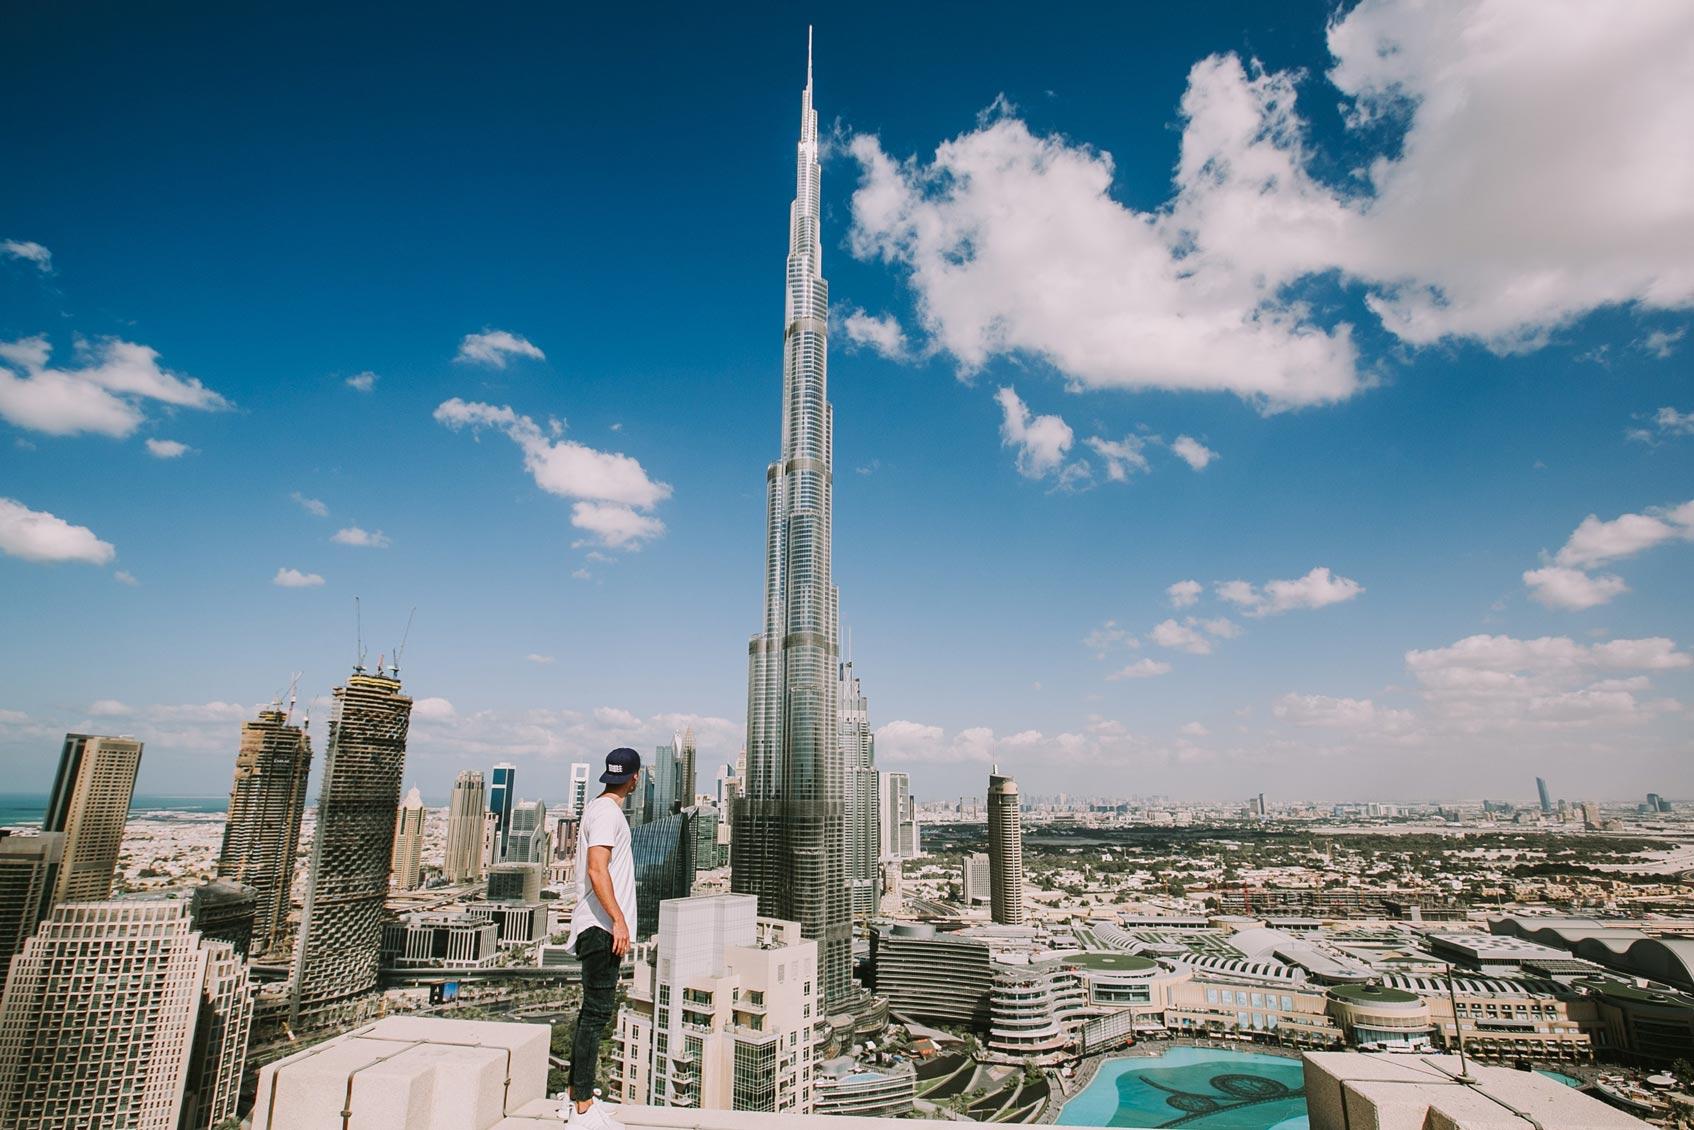 Дубаи смотровая площадка